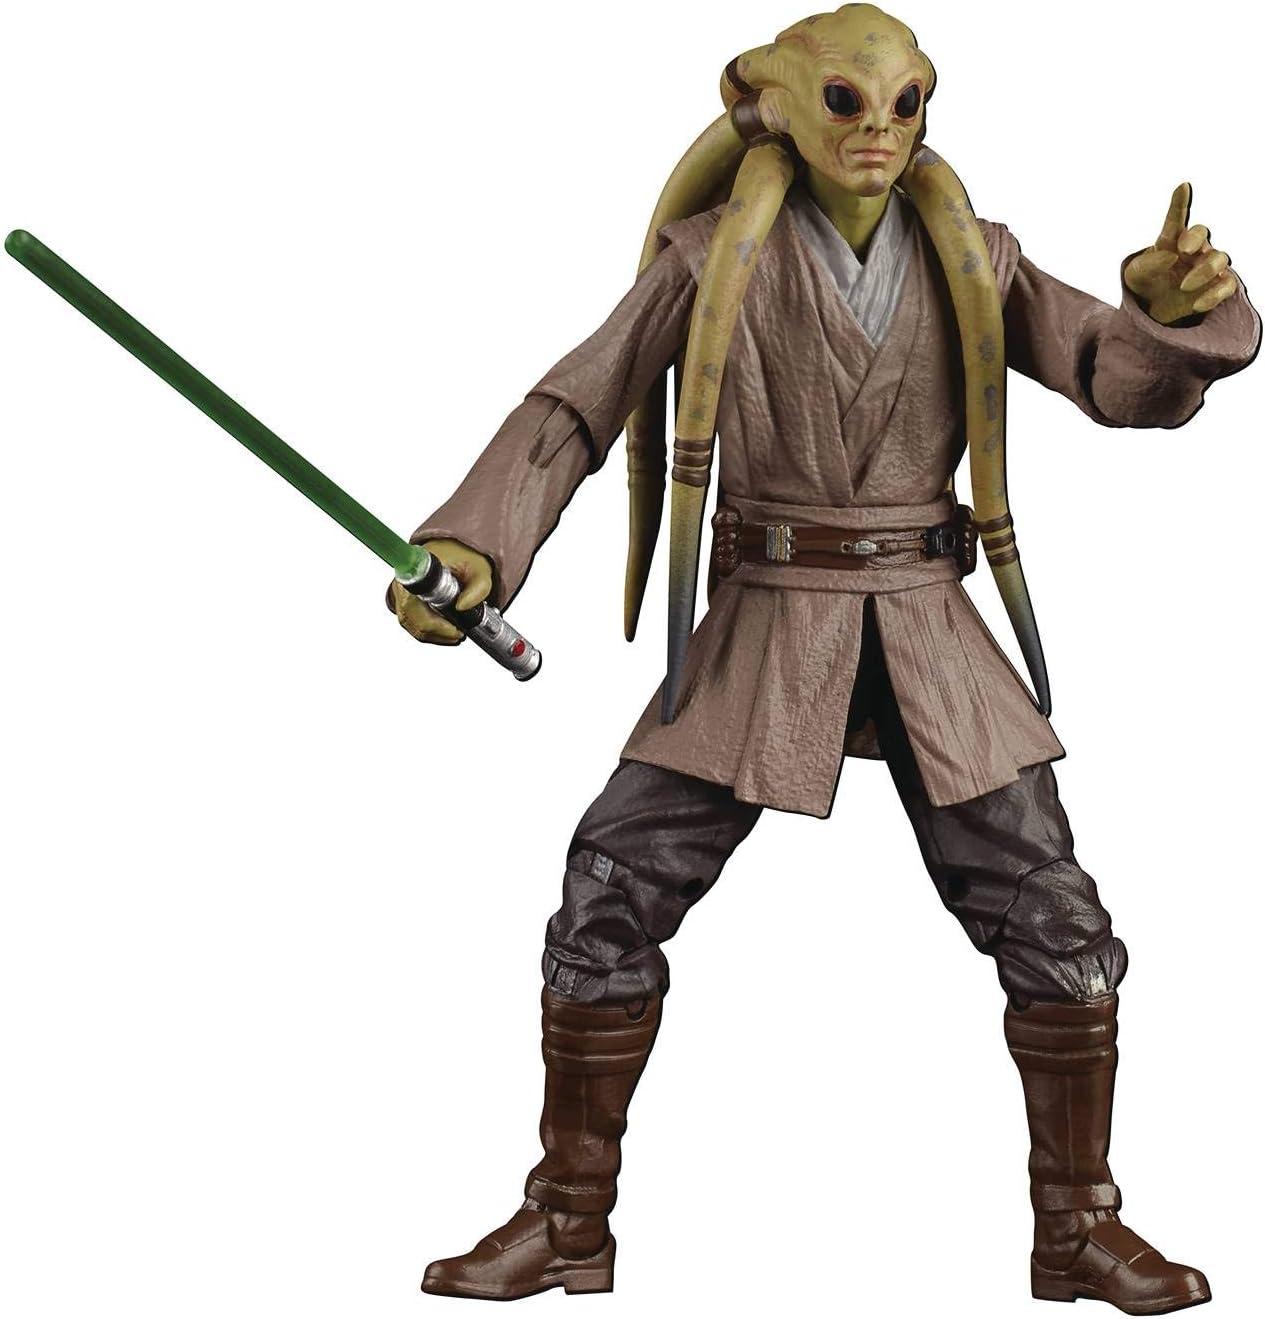 Star Wars Clone Wars Kit Fisto-army of the Republic